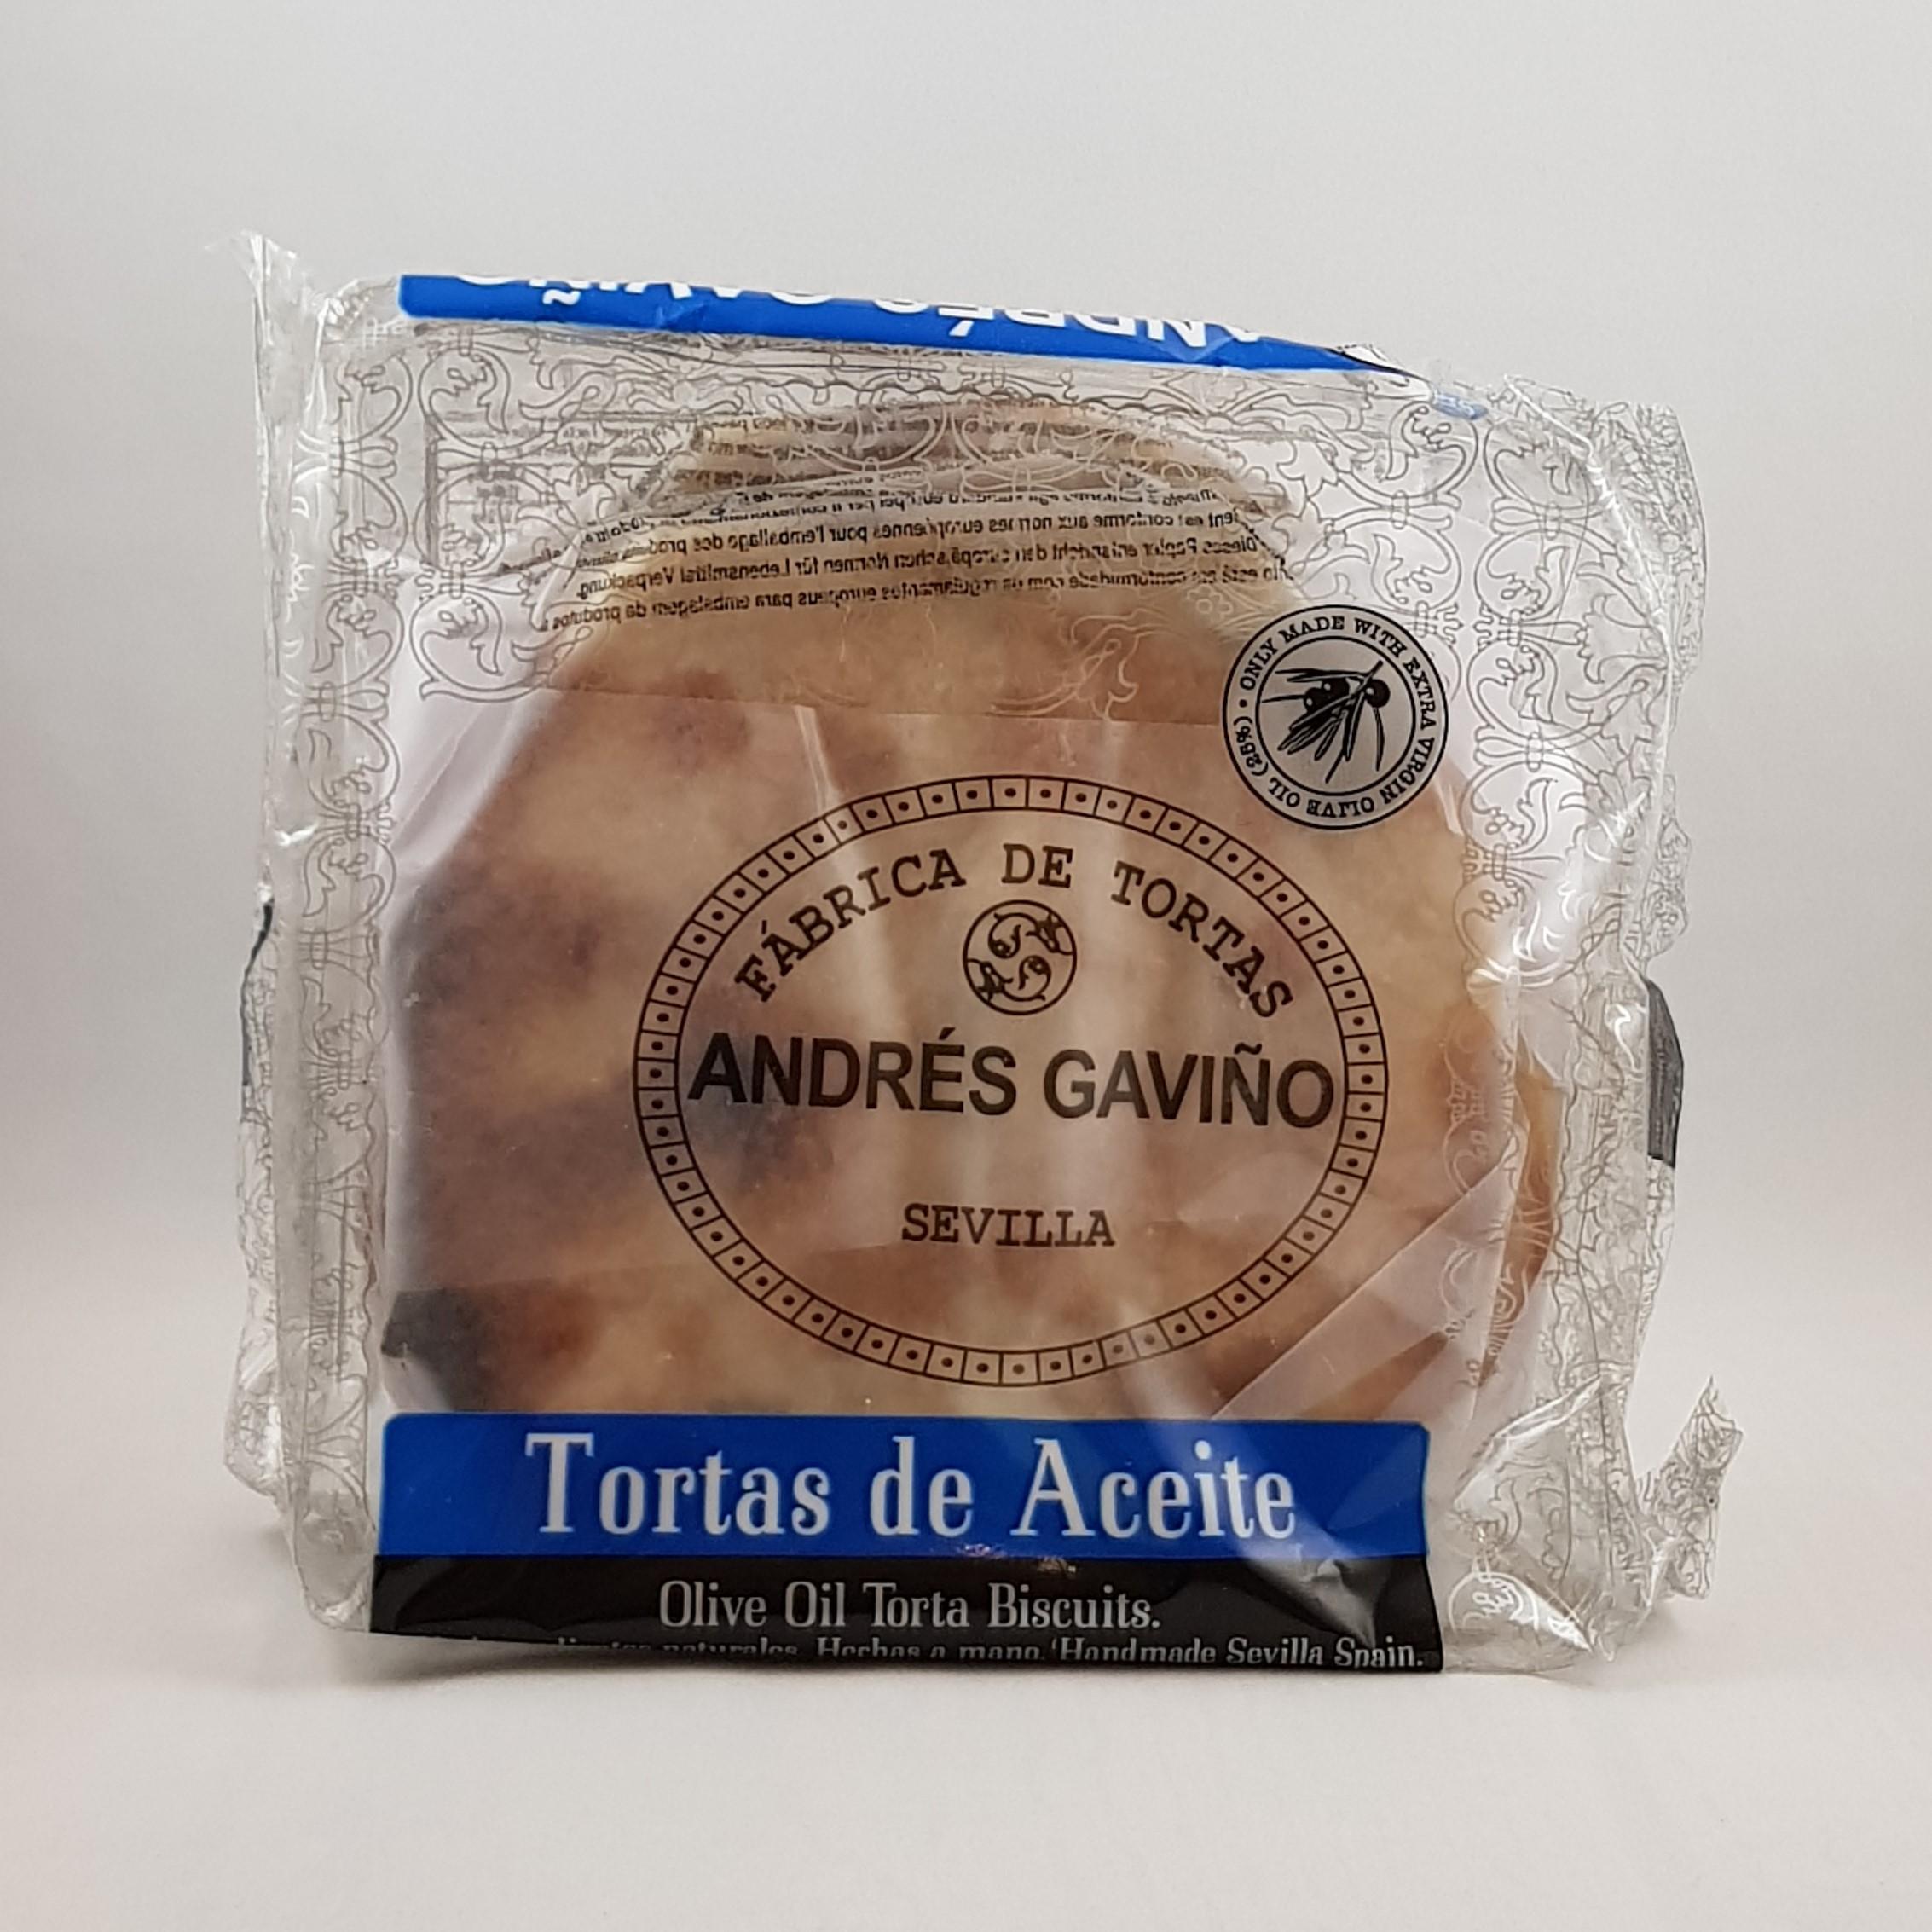 Andres Gavino Tortas de Aciete